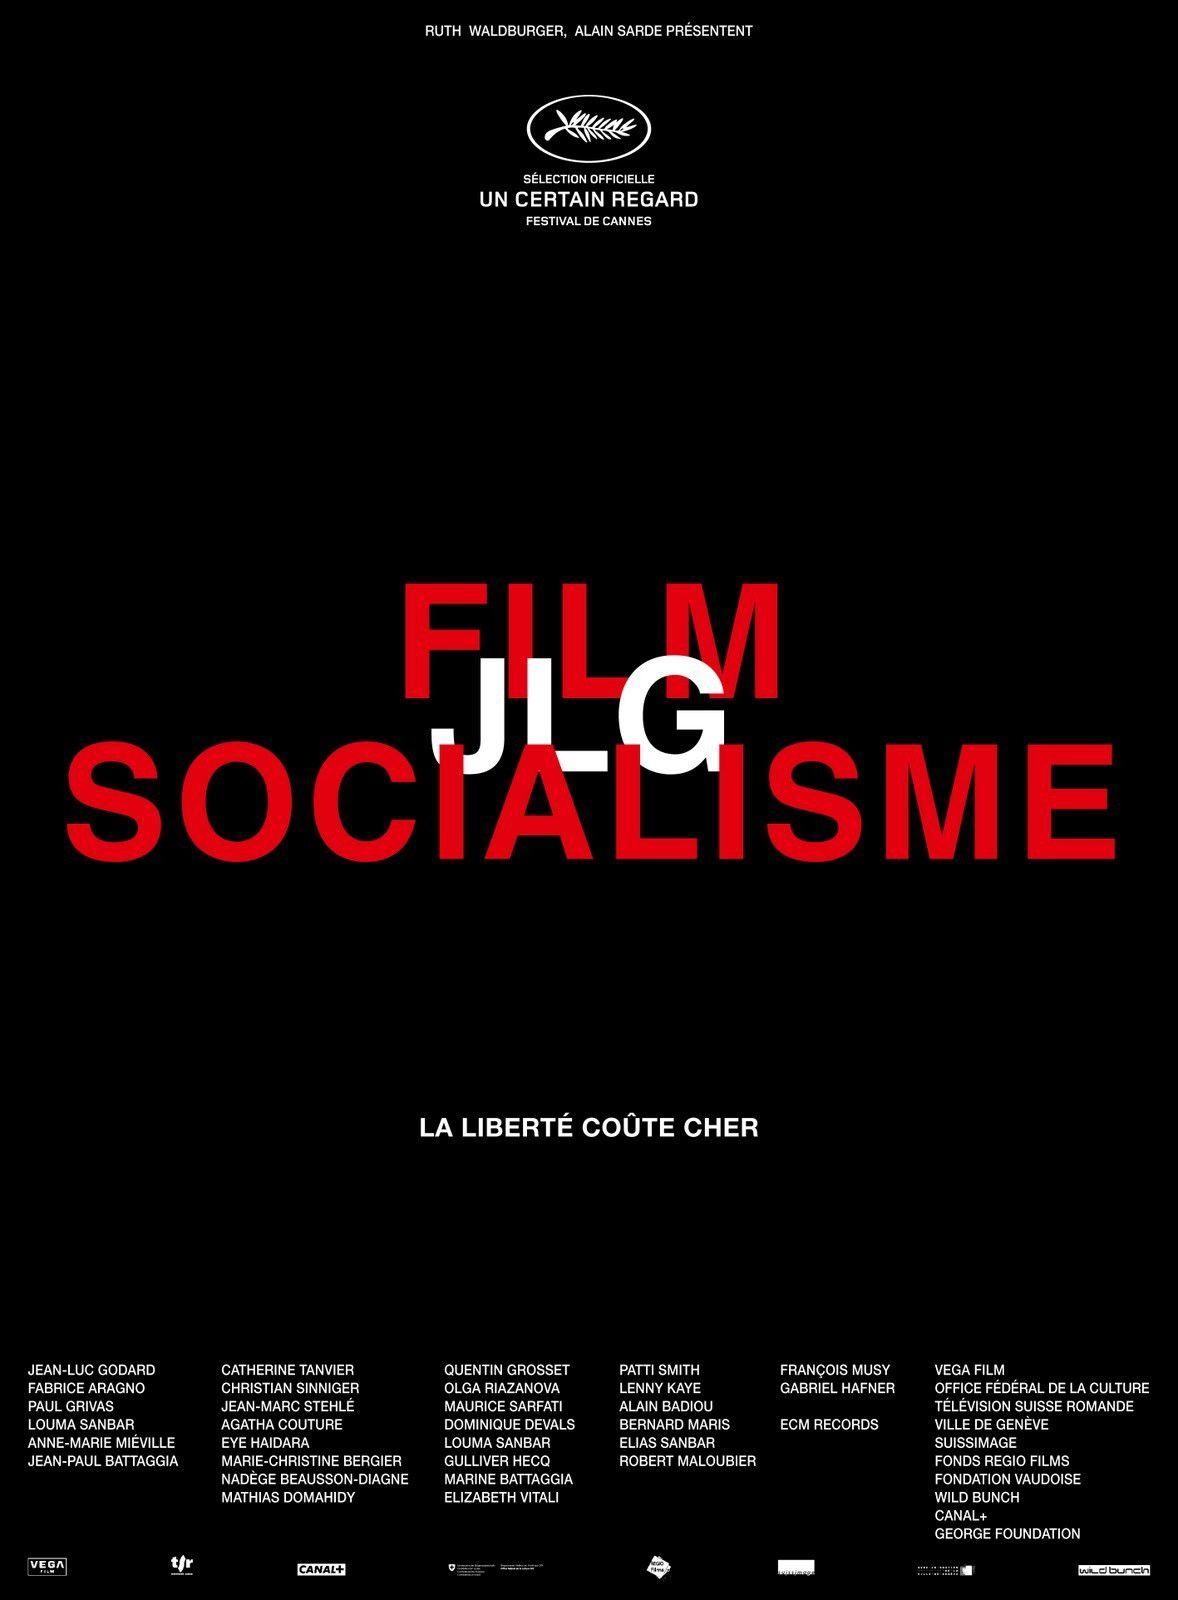 Film Socialisme - Film (2010)